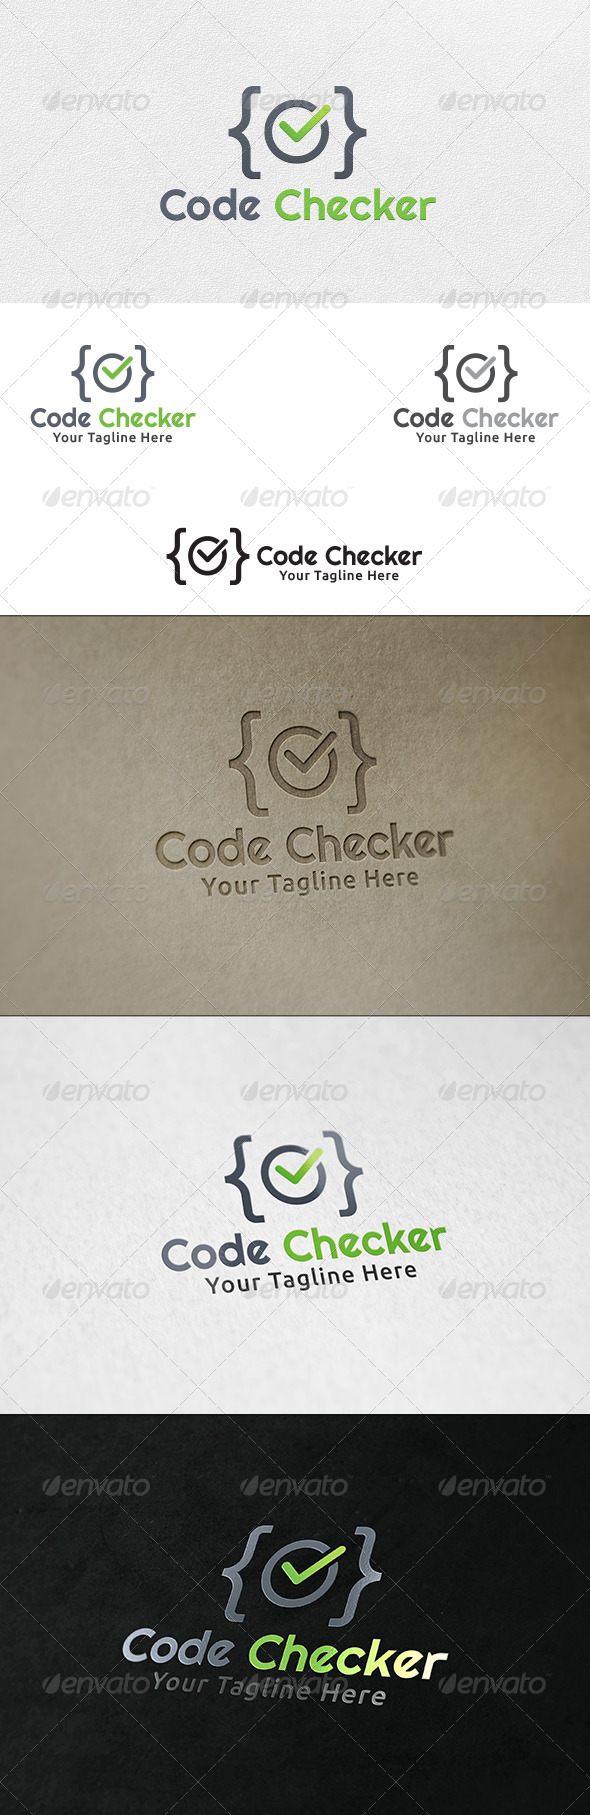 GraphicRiver Code Checker Logo Template 6415468